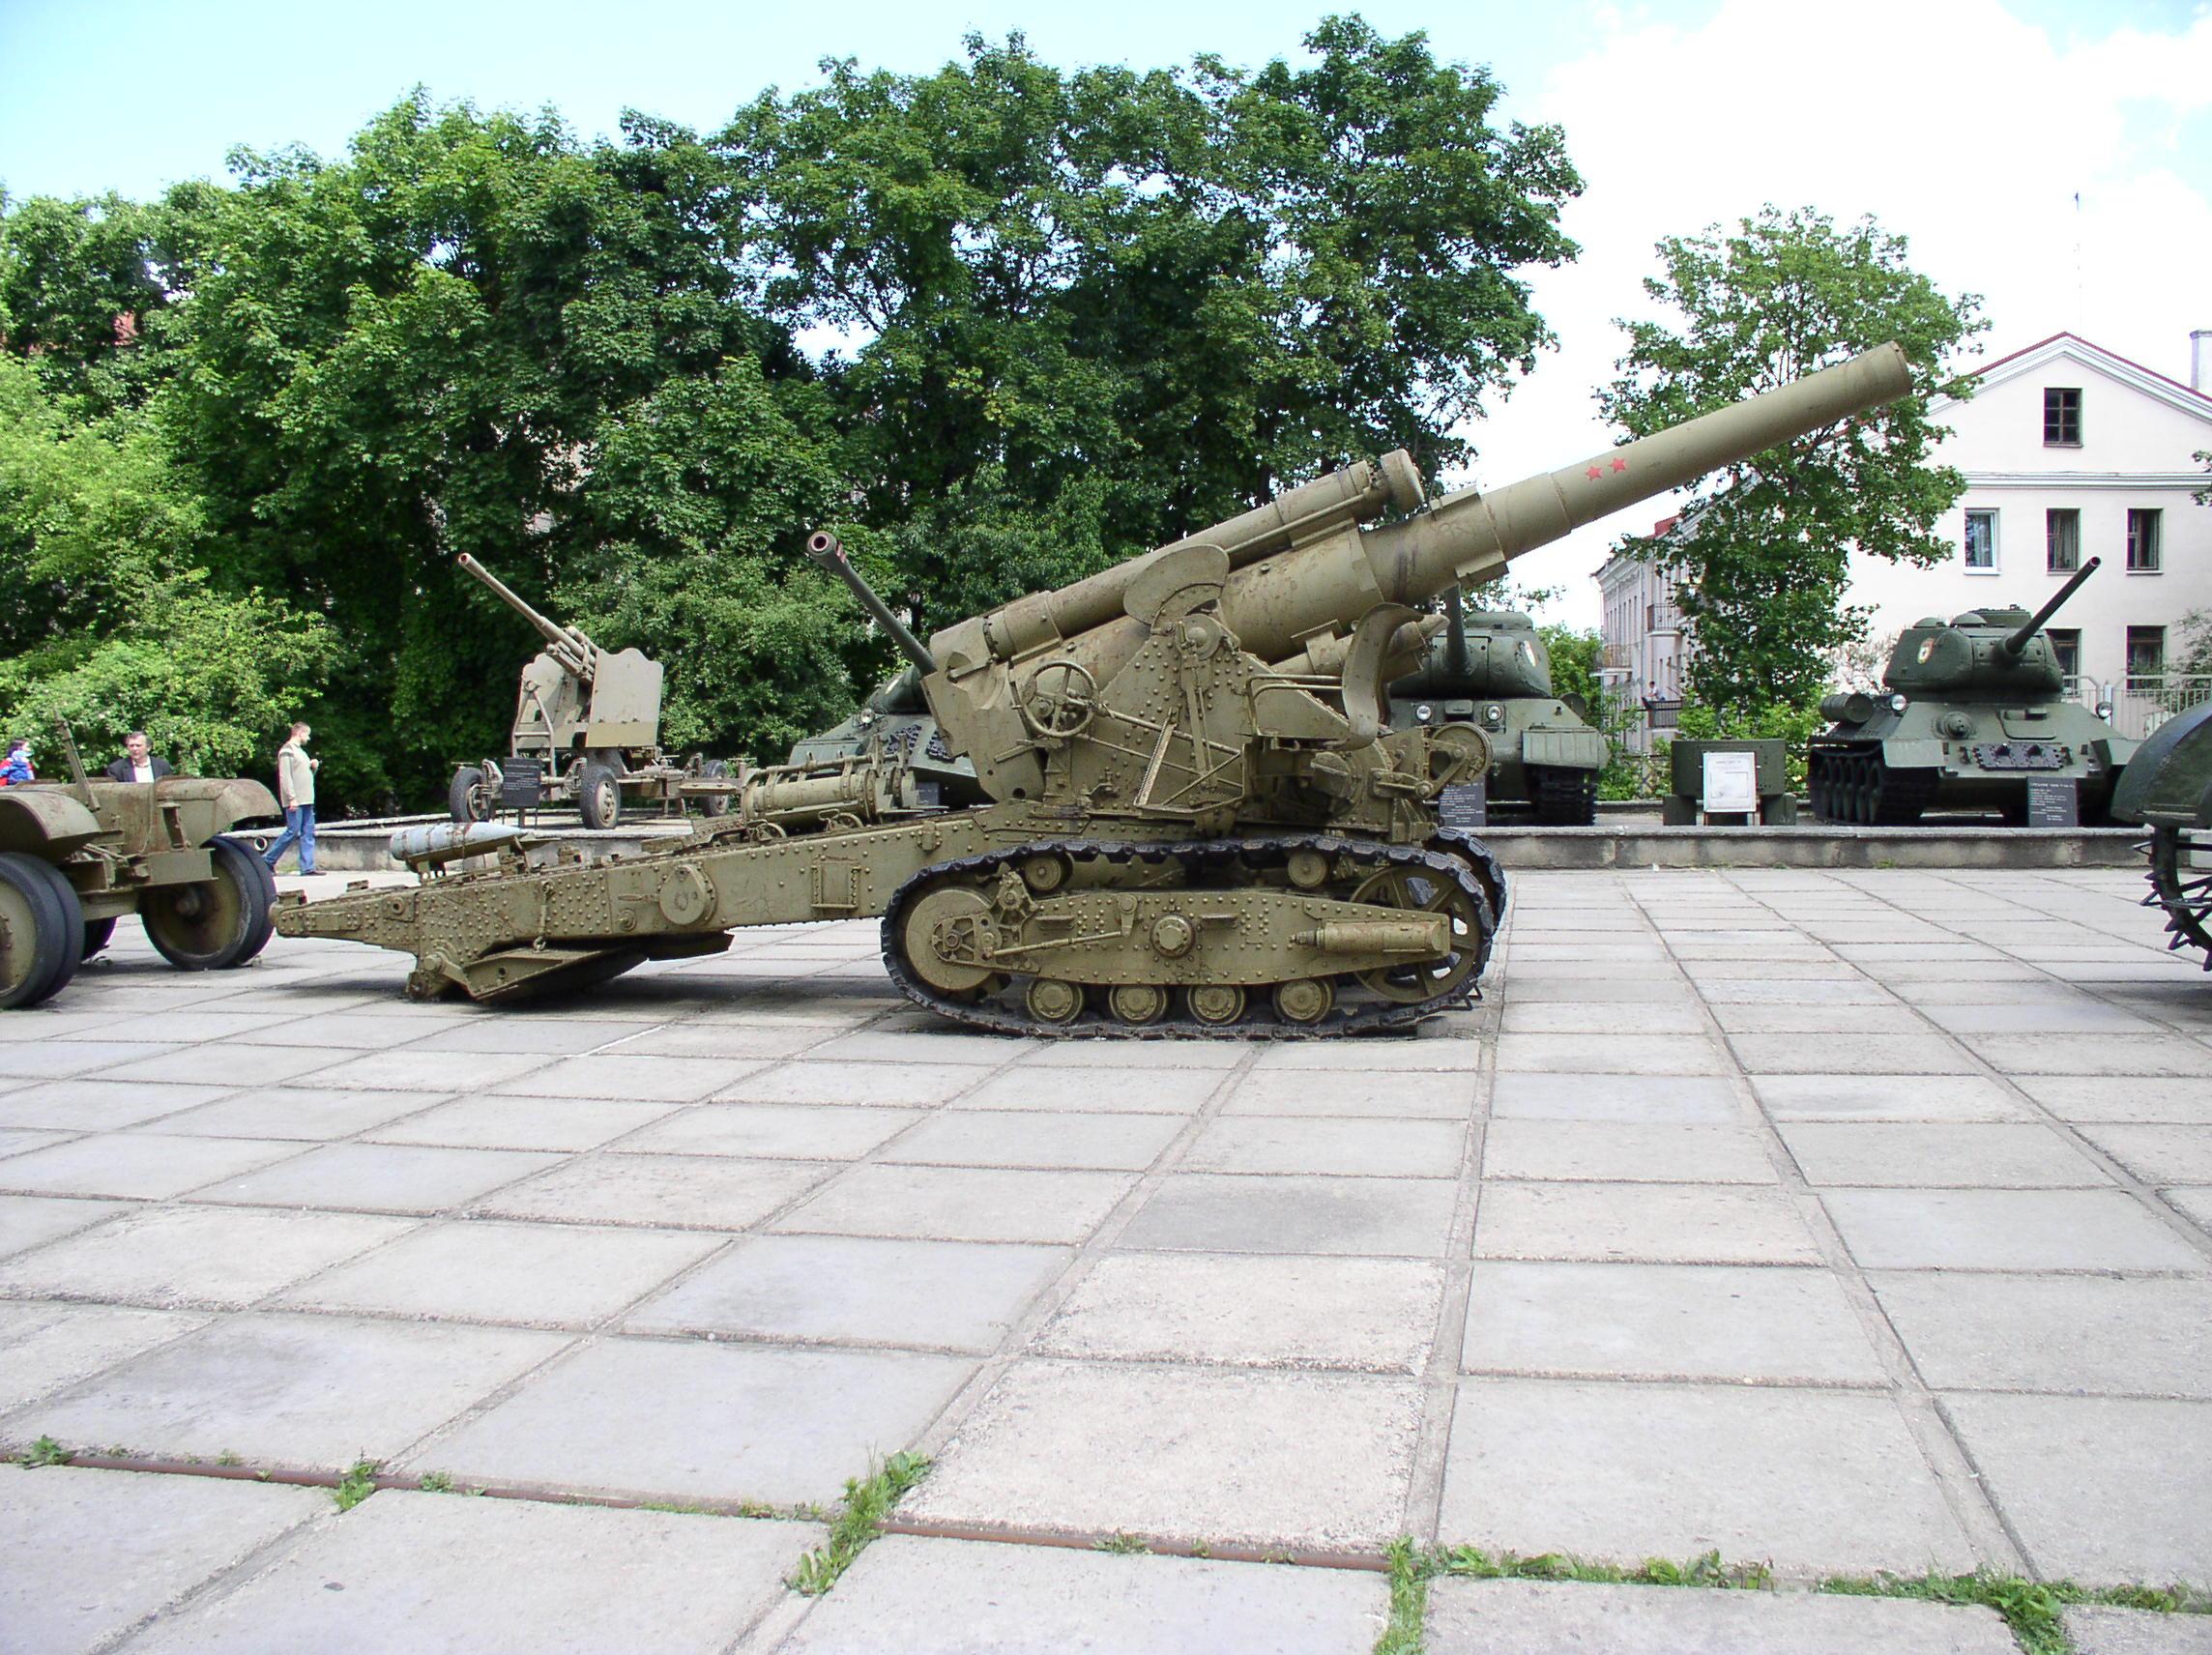 Best Most Impressive Artillery Piece Of Ww2